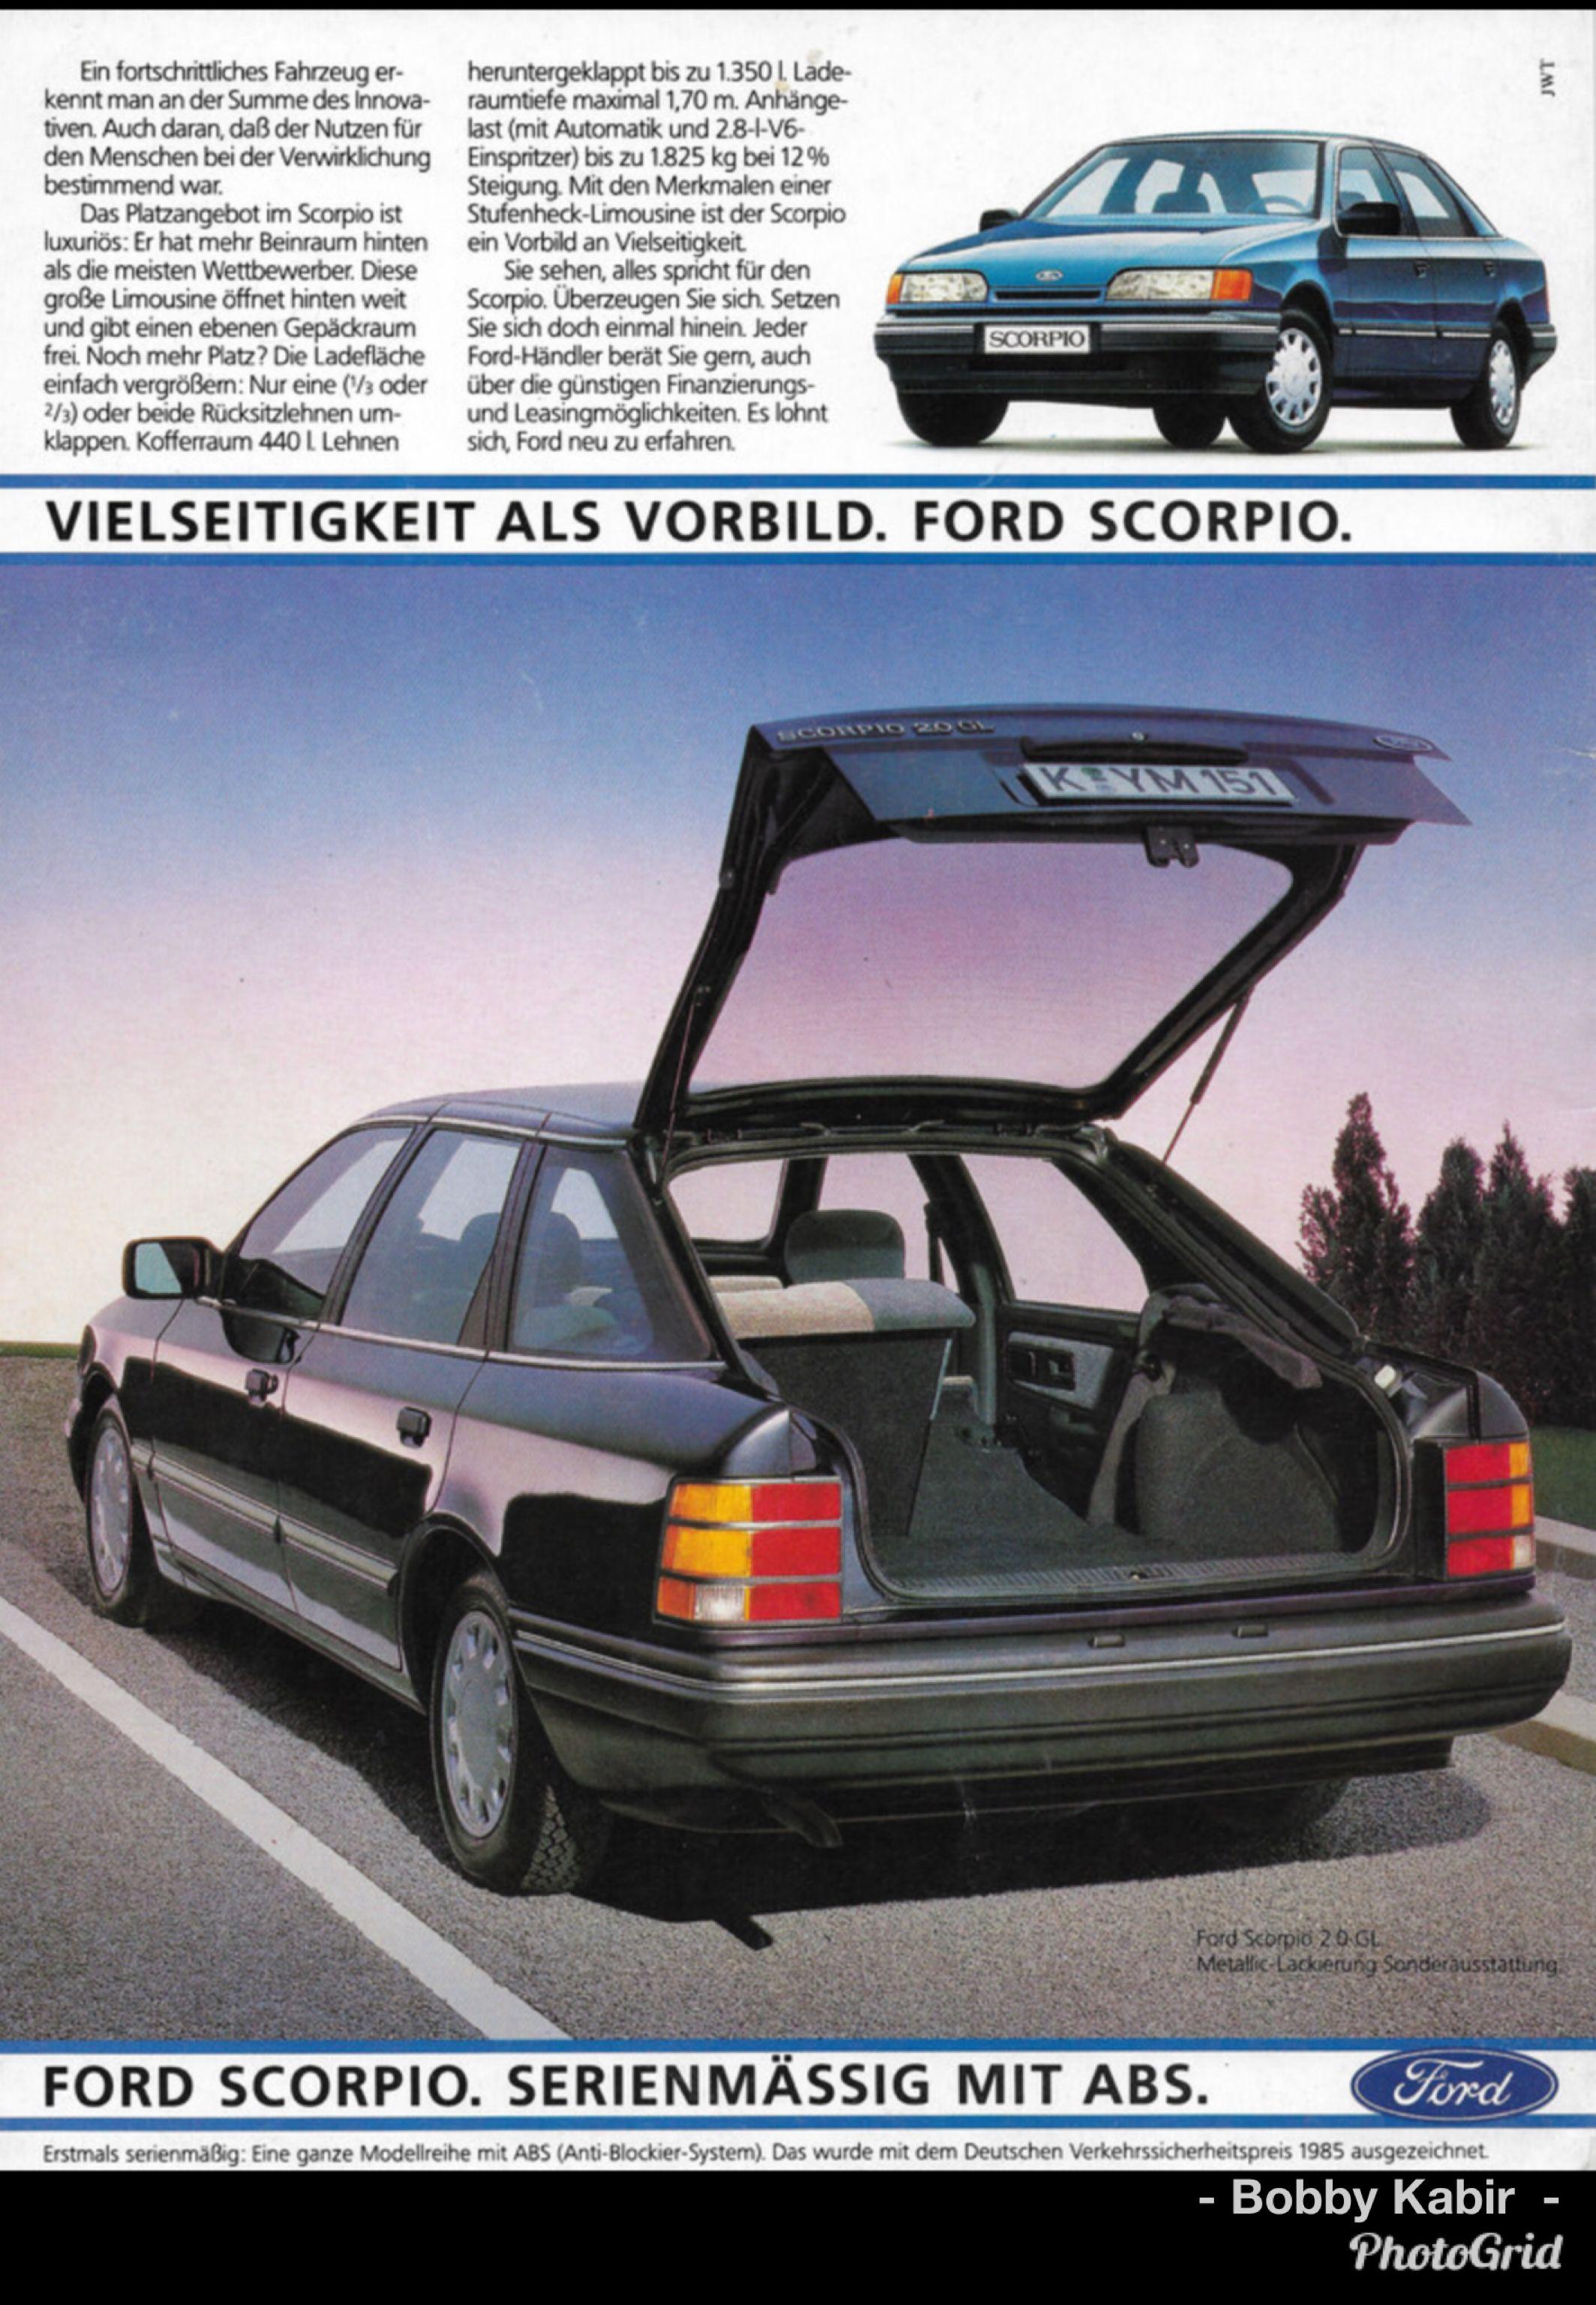 1986 Ford Scorpio 2 0 Gl Germany By Michael On Flickr Limousine Auto Bild Autobilder